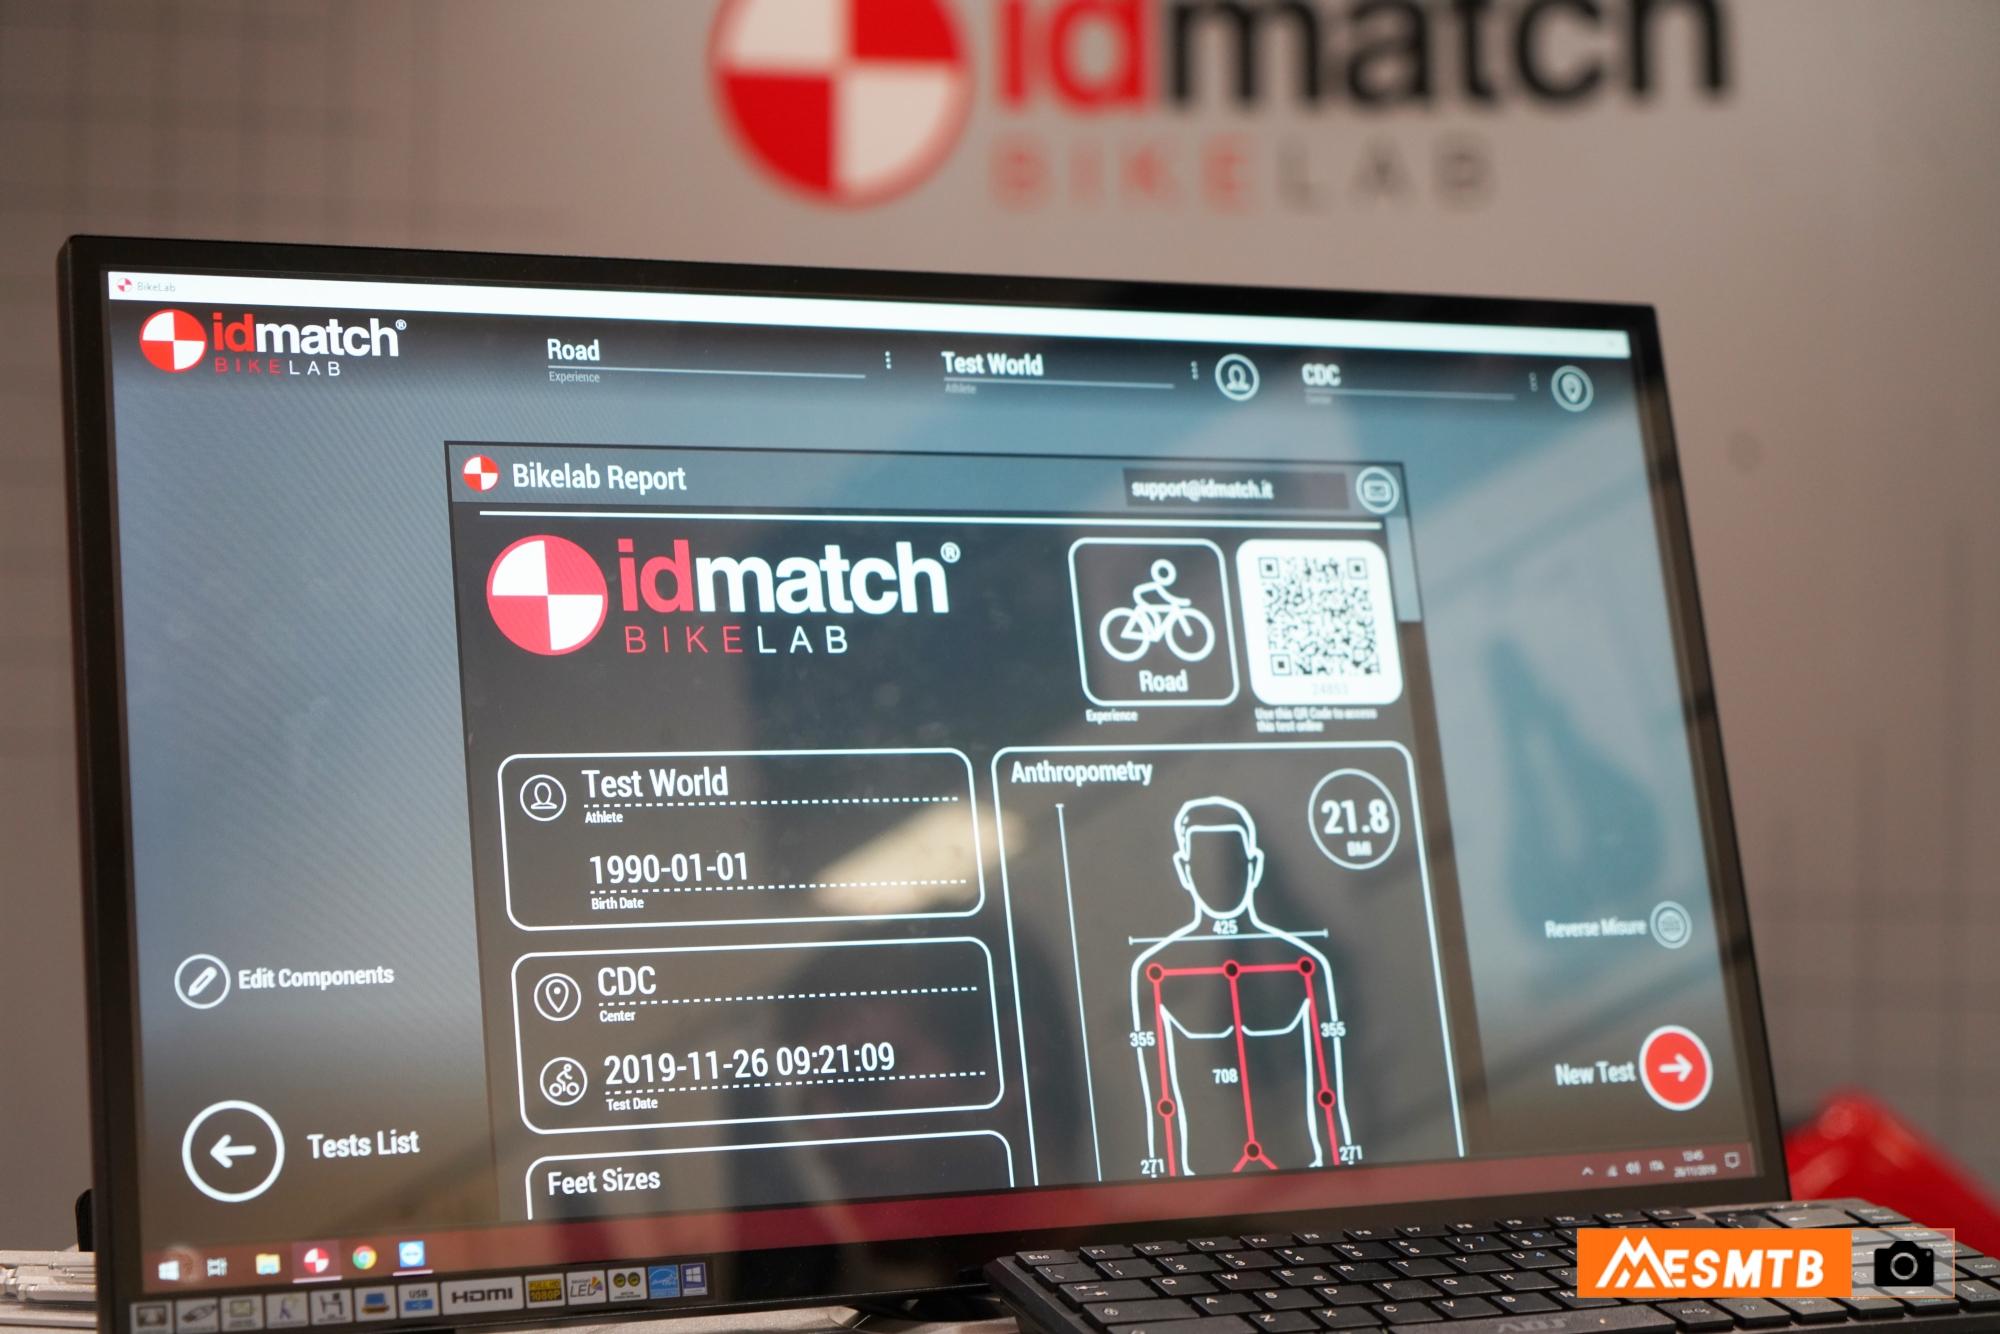 idmatch BikeLab